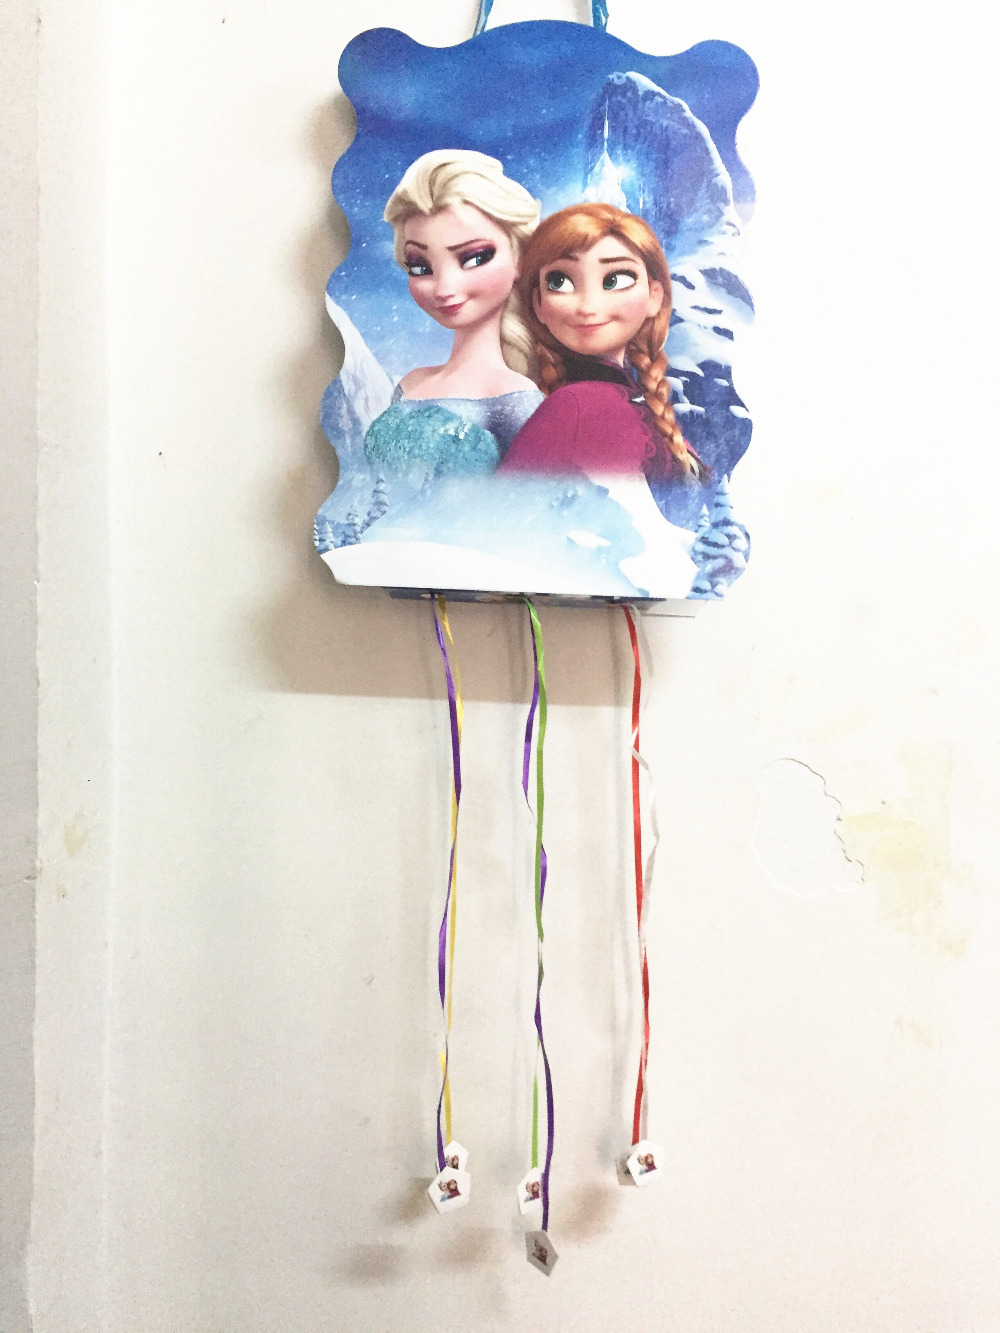 Anna/elsa Princess Frozen Birthday Party Decor Have Fun Game Supplies Snow Queen Freezing Paperboard Folding Pinata 1pcs